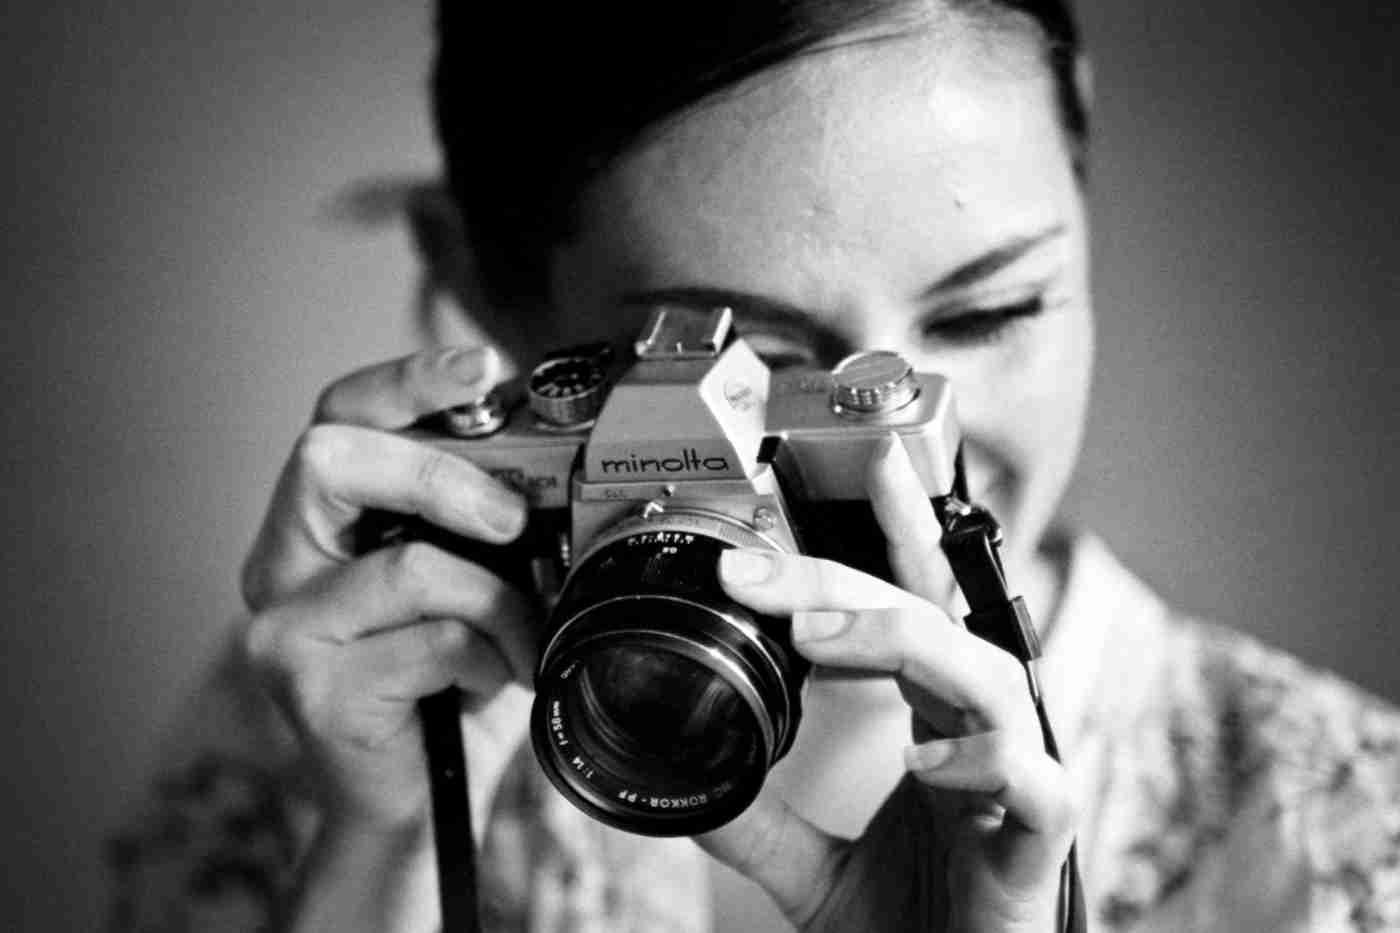 photographer with Minolta 35mm film SLR camera